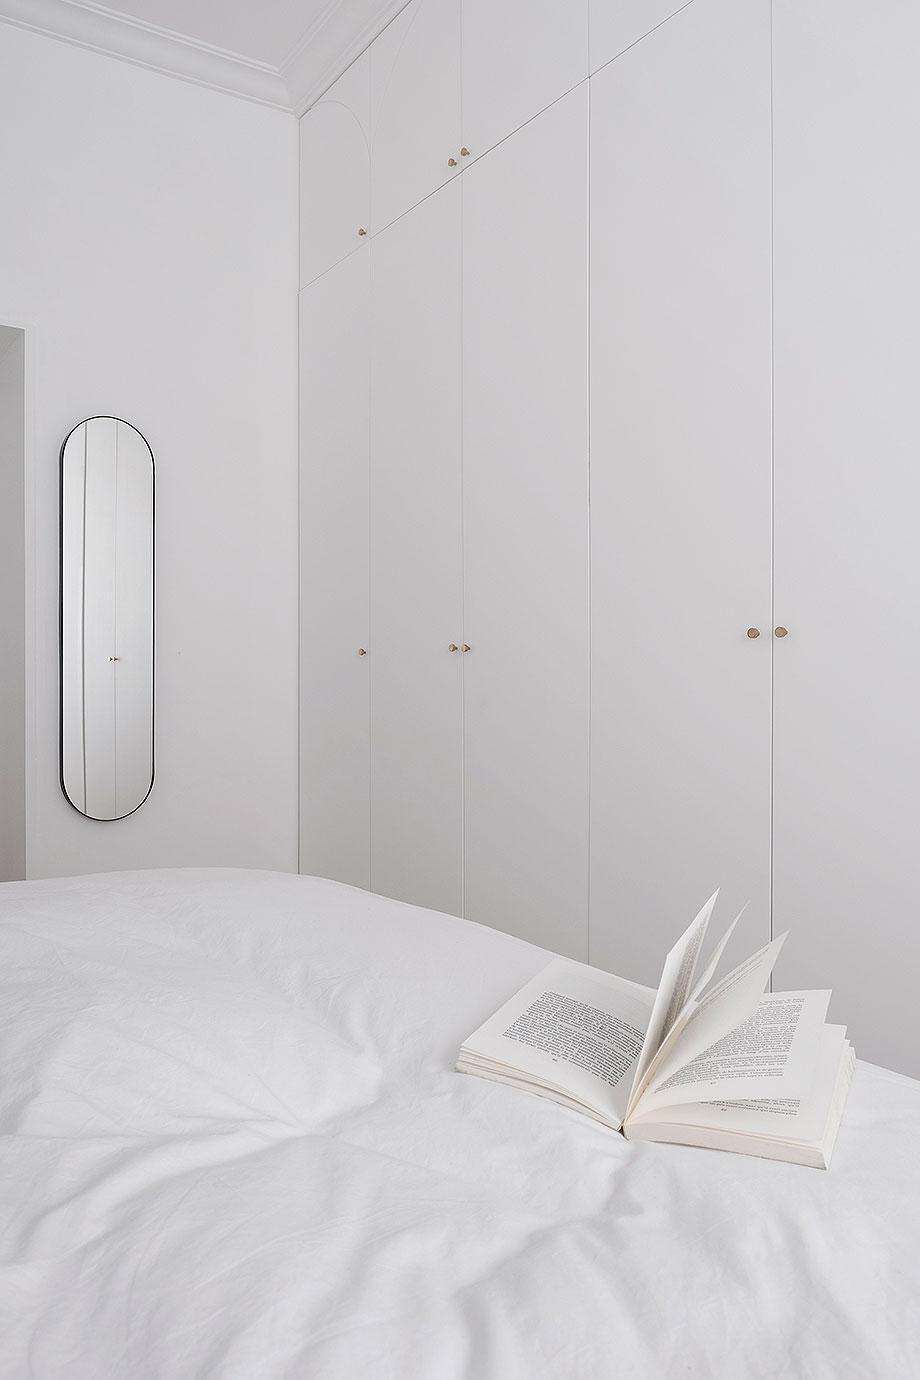 reforma integral de un apartamento en paris por anthropie architecture (s) (11) - foto juliette alexandre